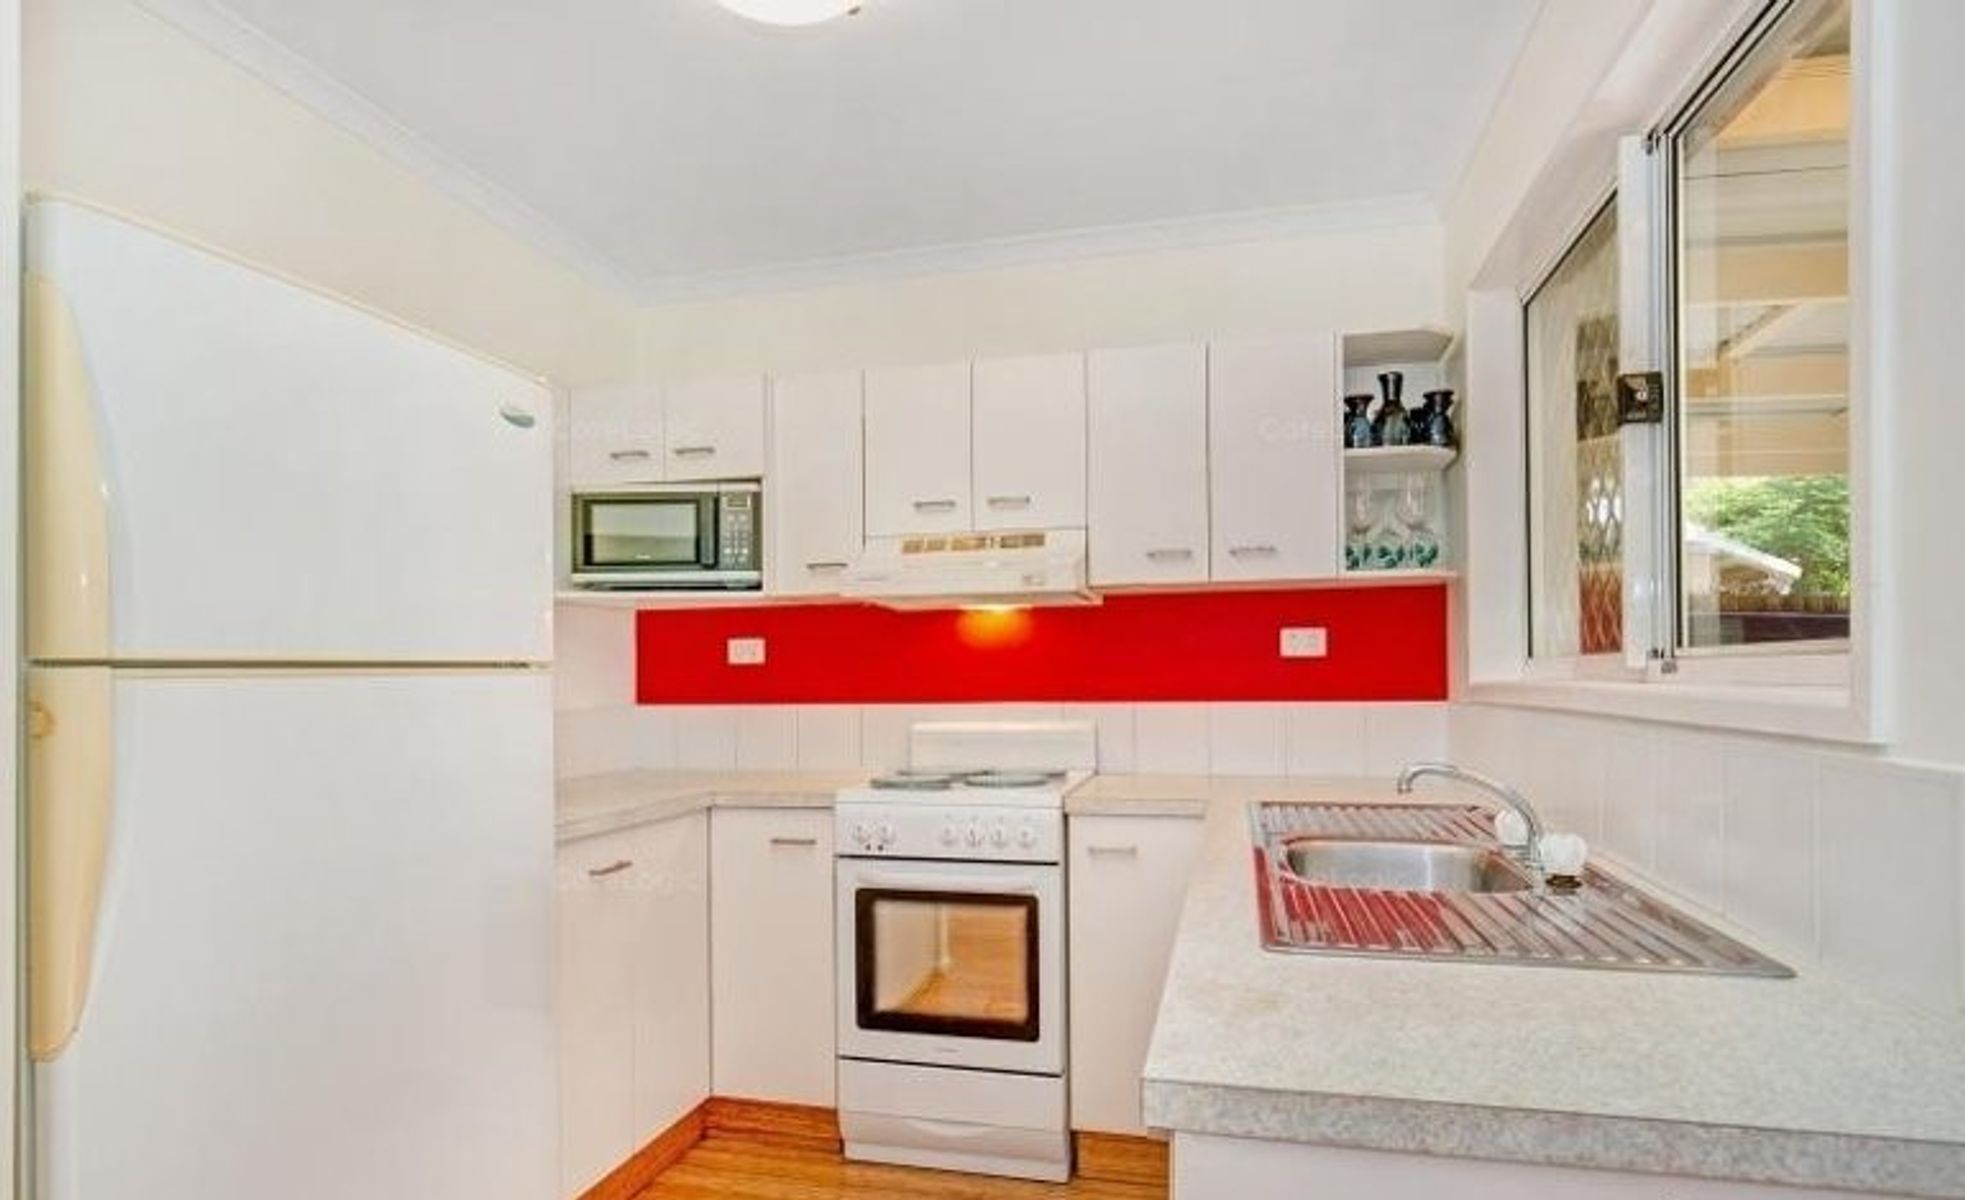 10/52 Frank Street, Thorneside, QLD 4158